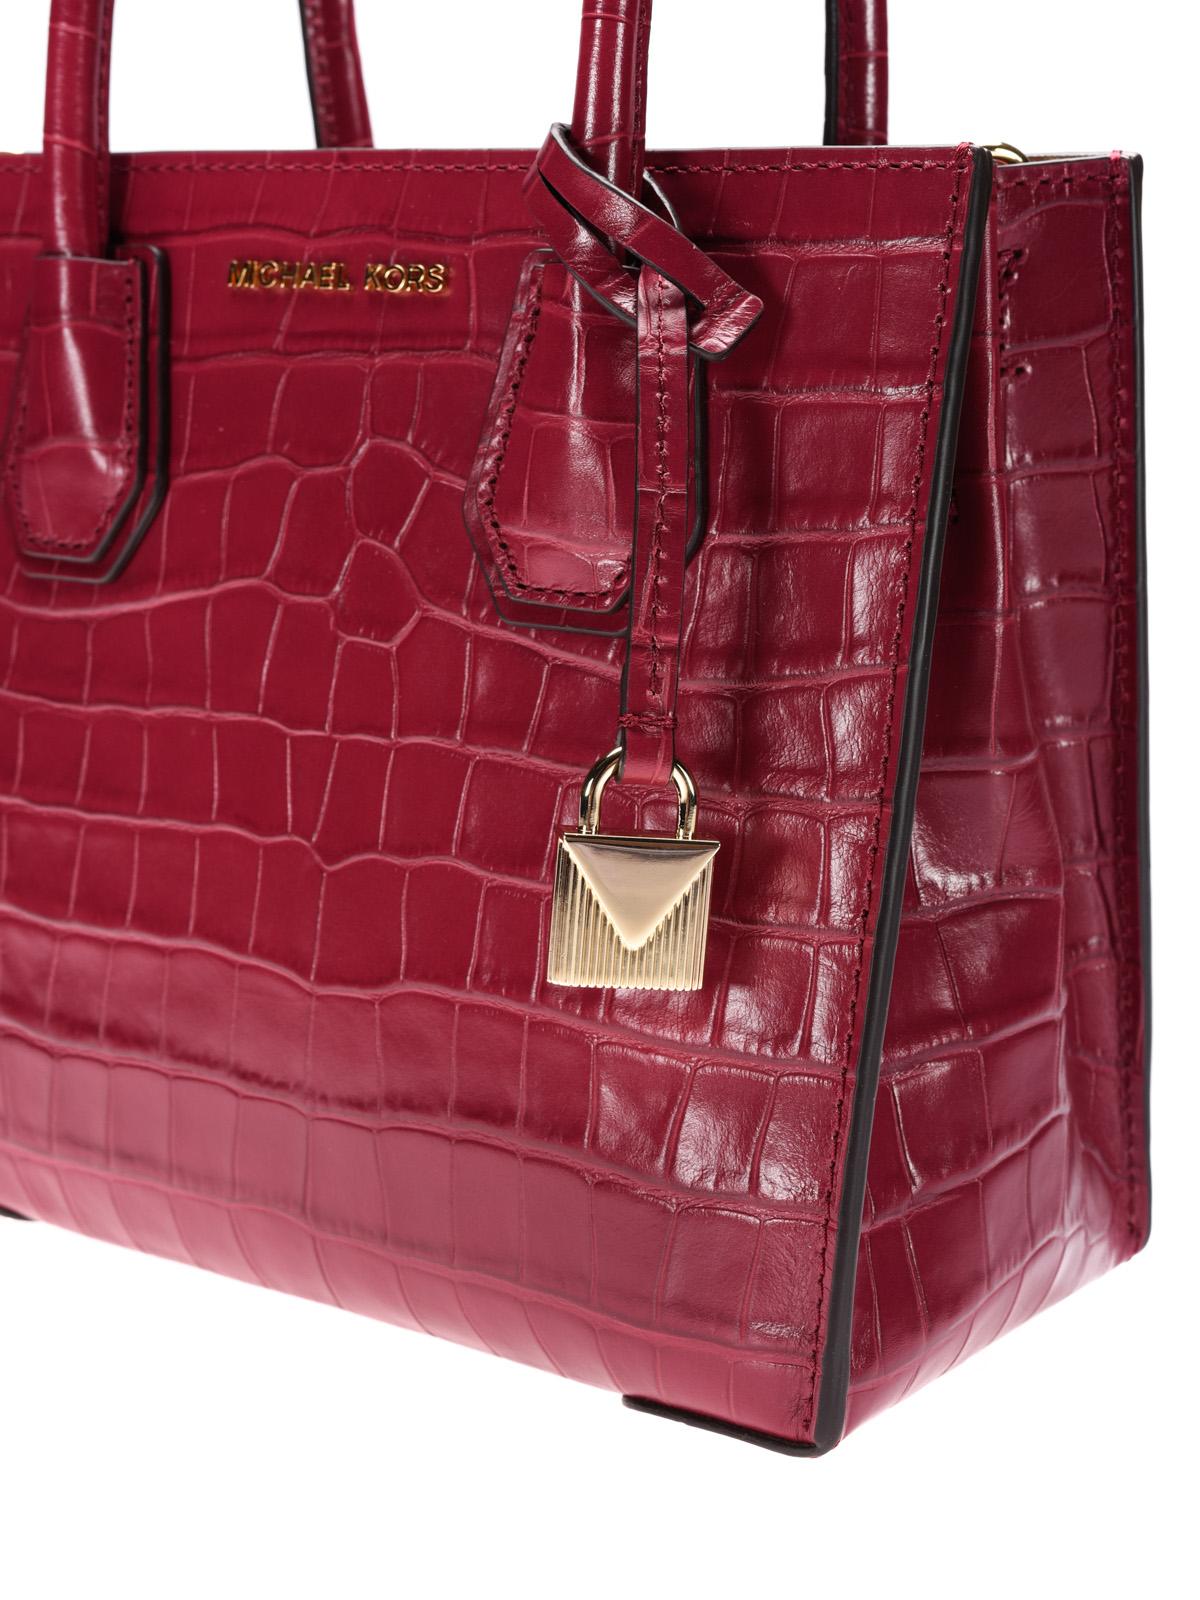 Mercer croco print red leather bag